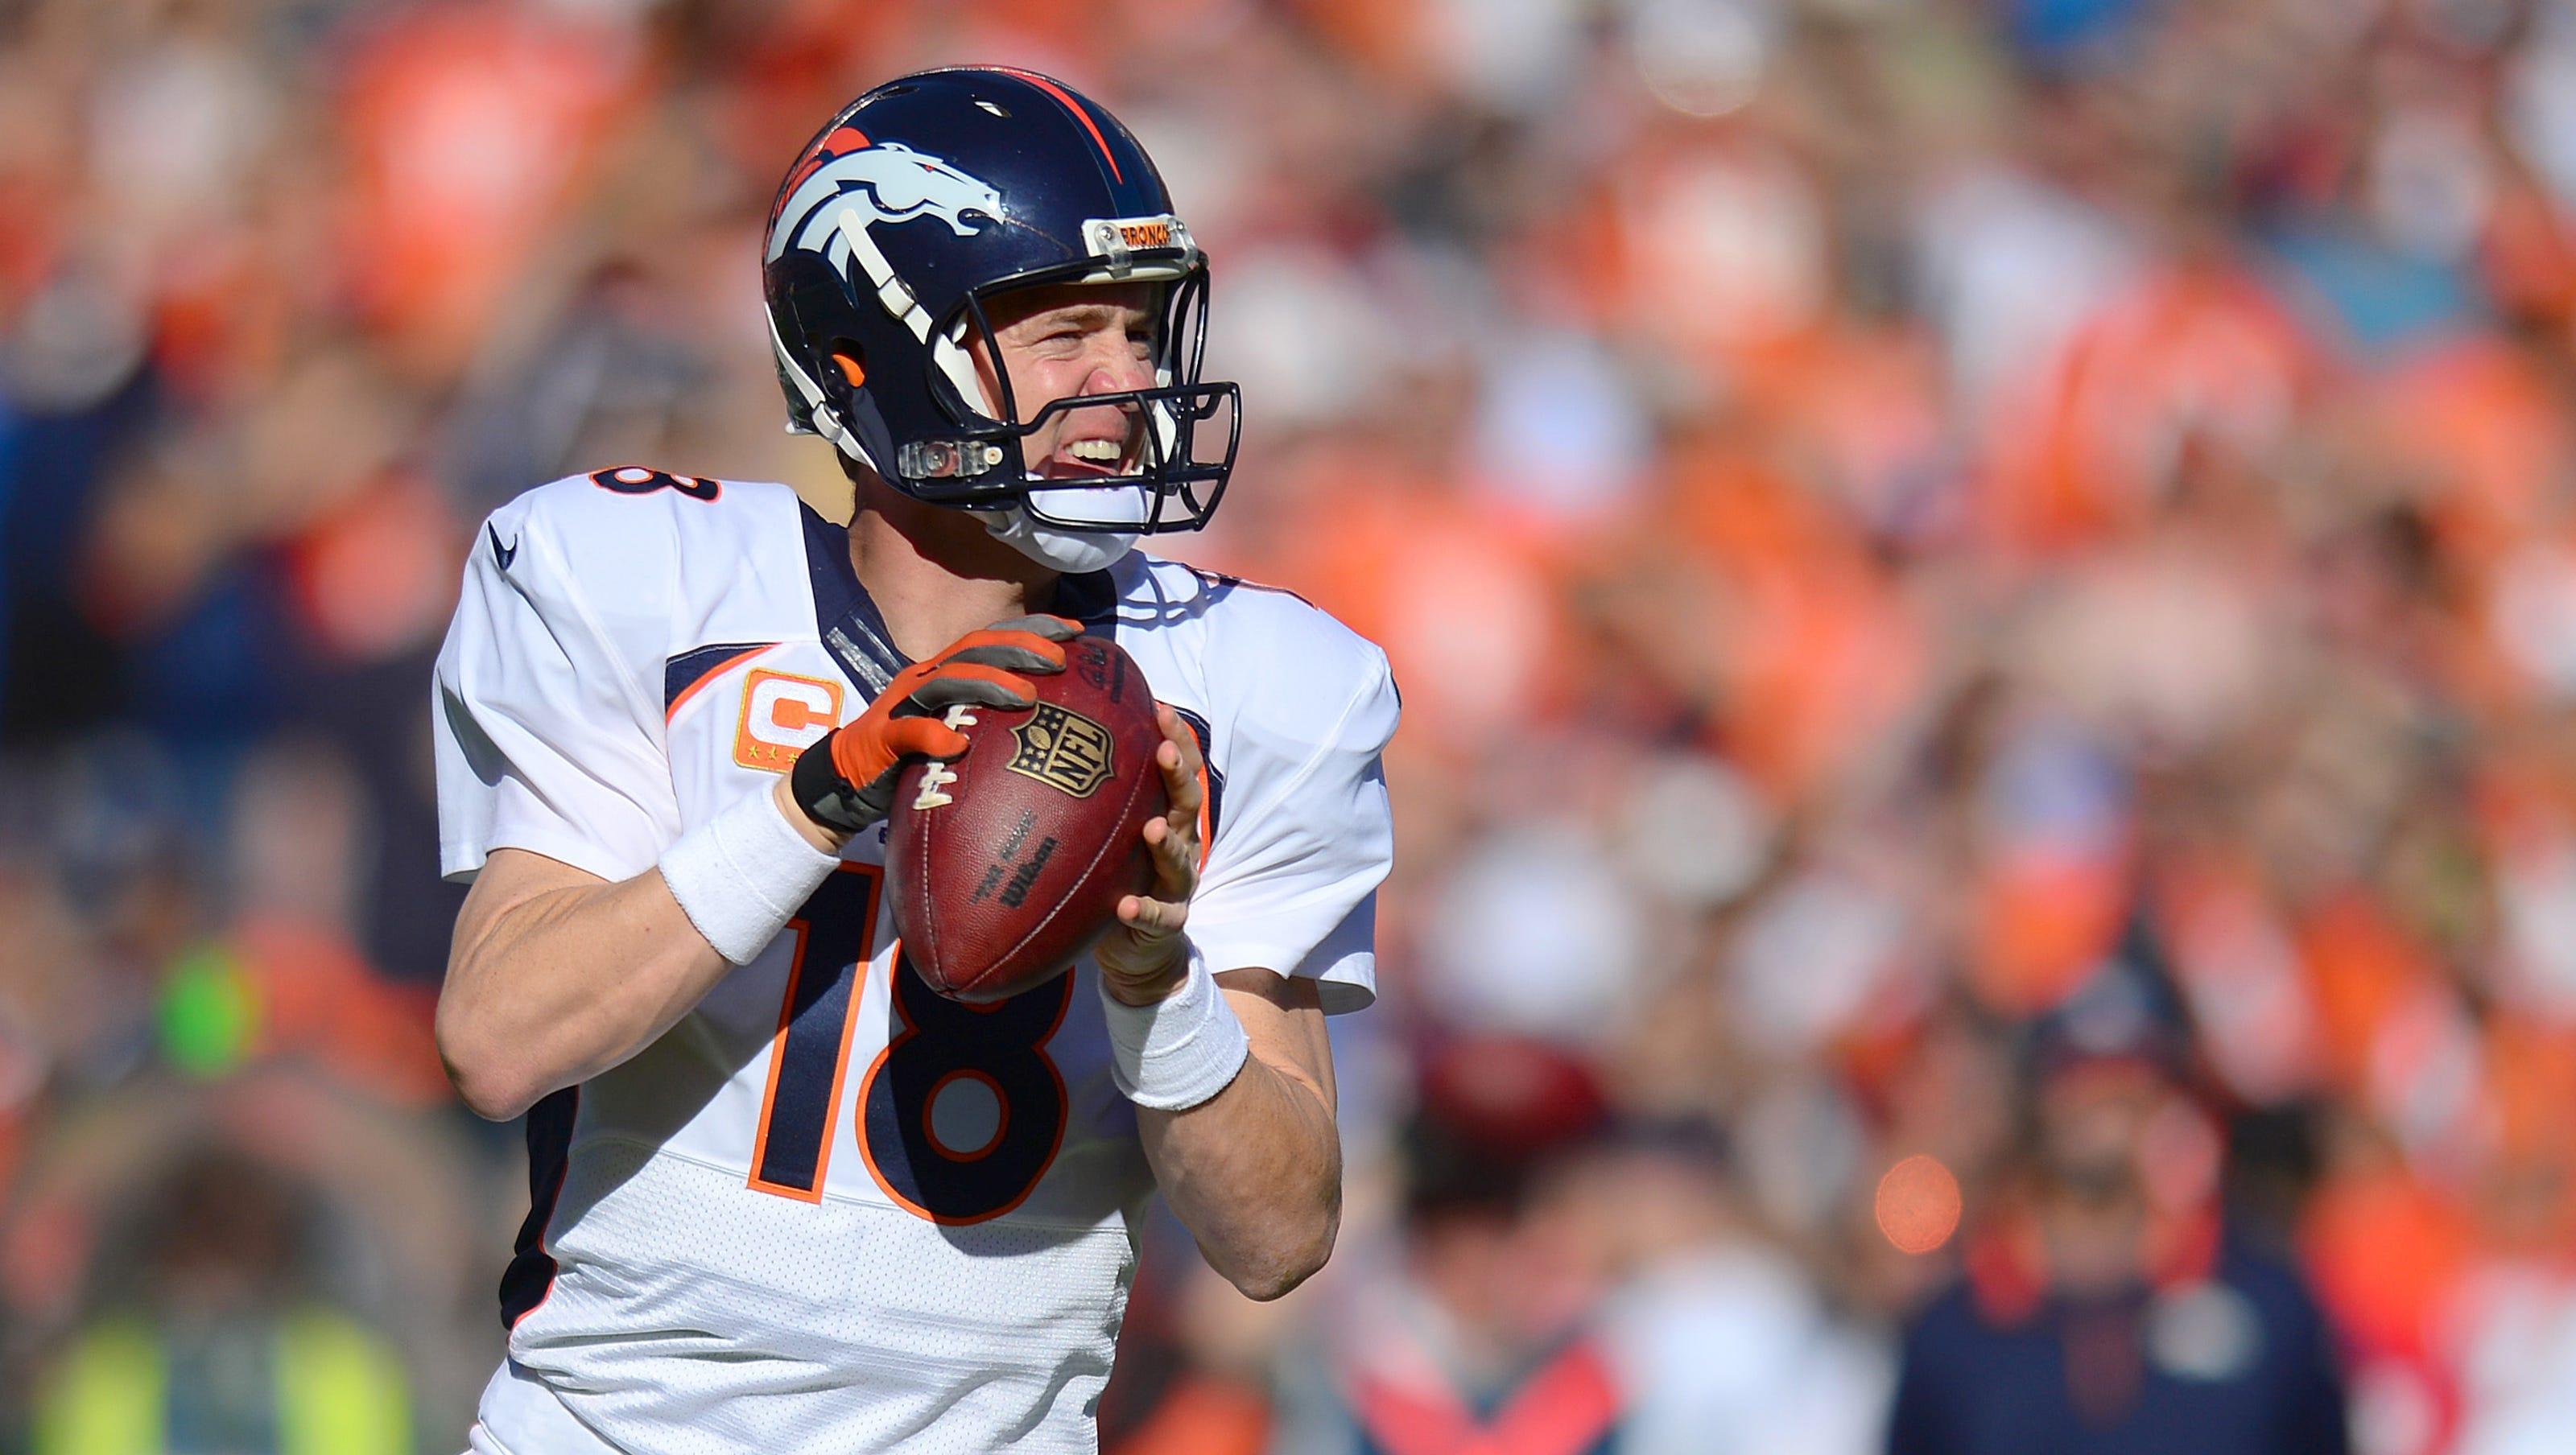 Peyton Manning Briefly Exits Broncos Game But Returns